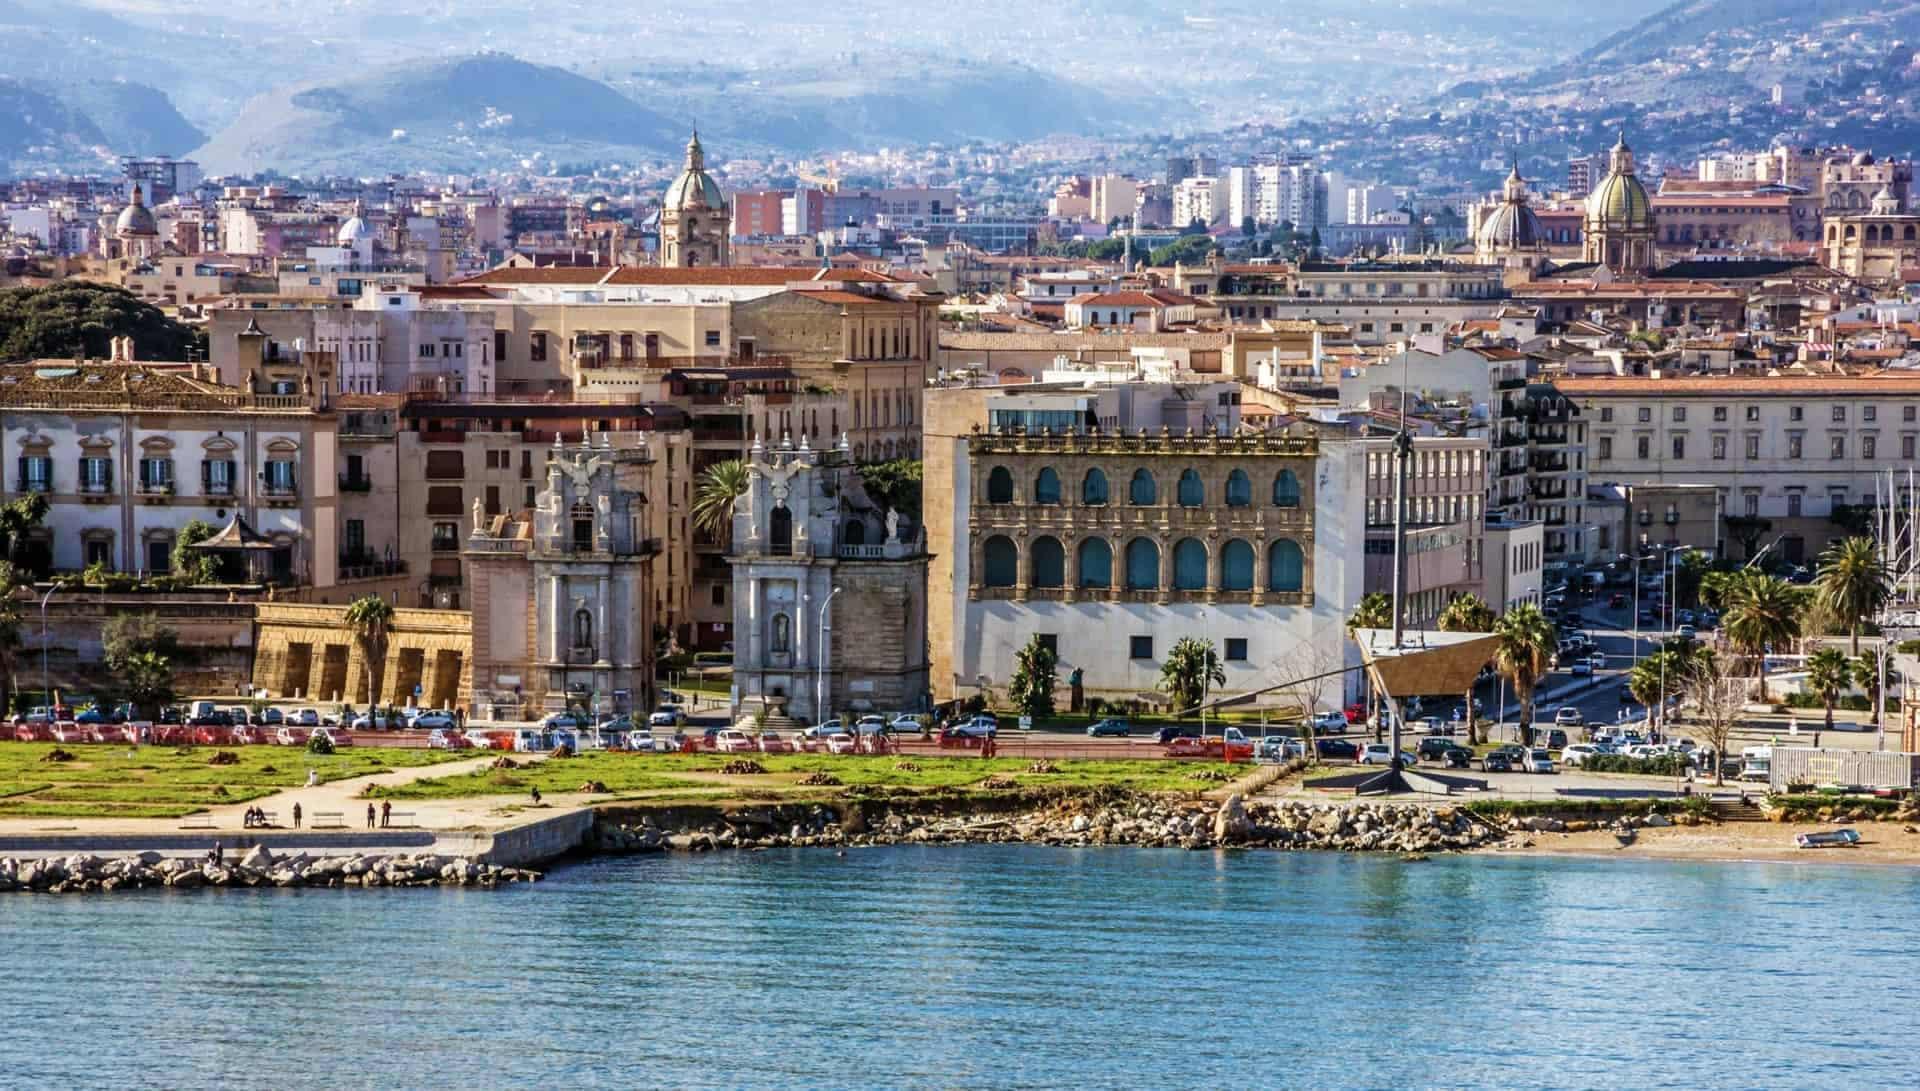 Palermo seaside